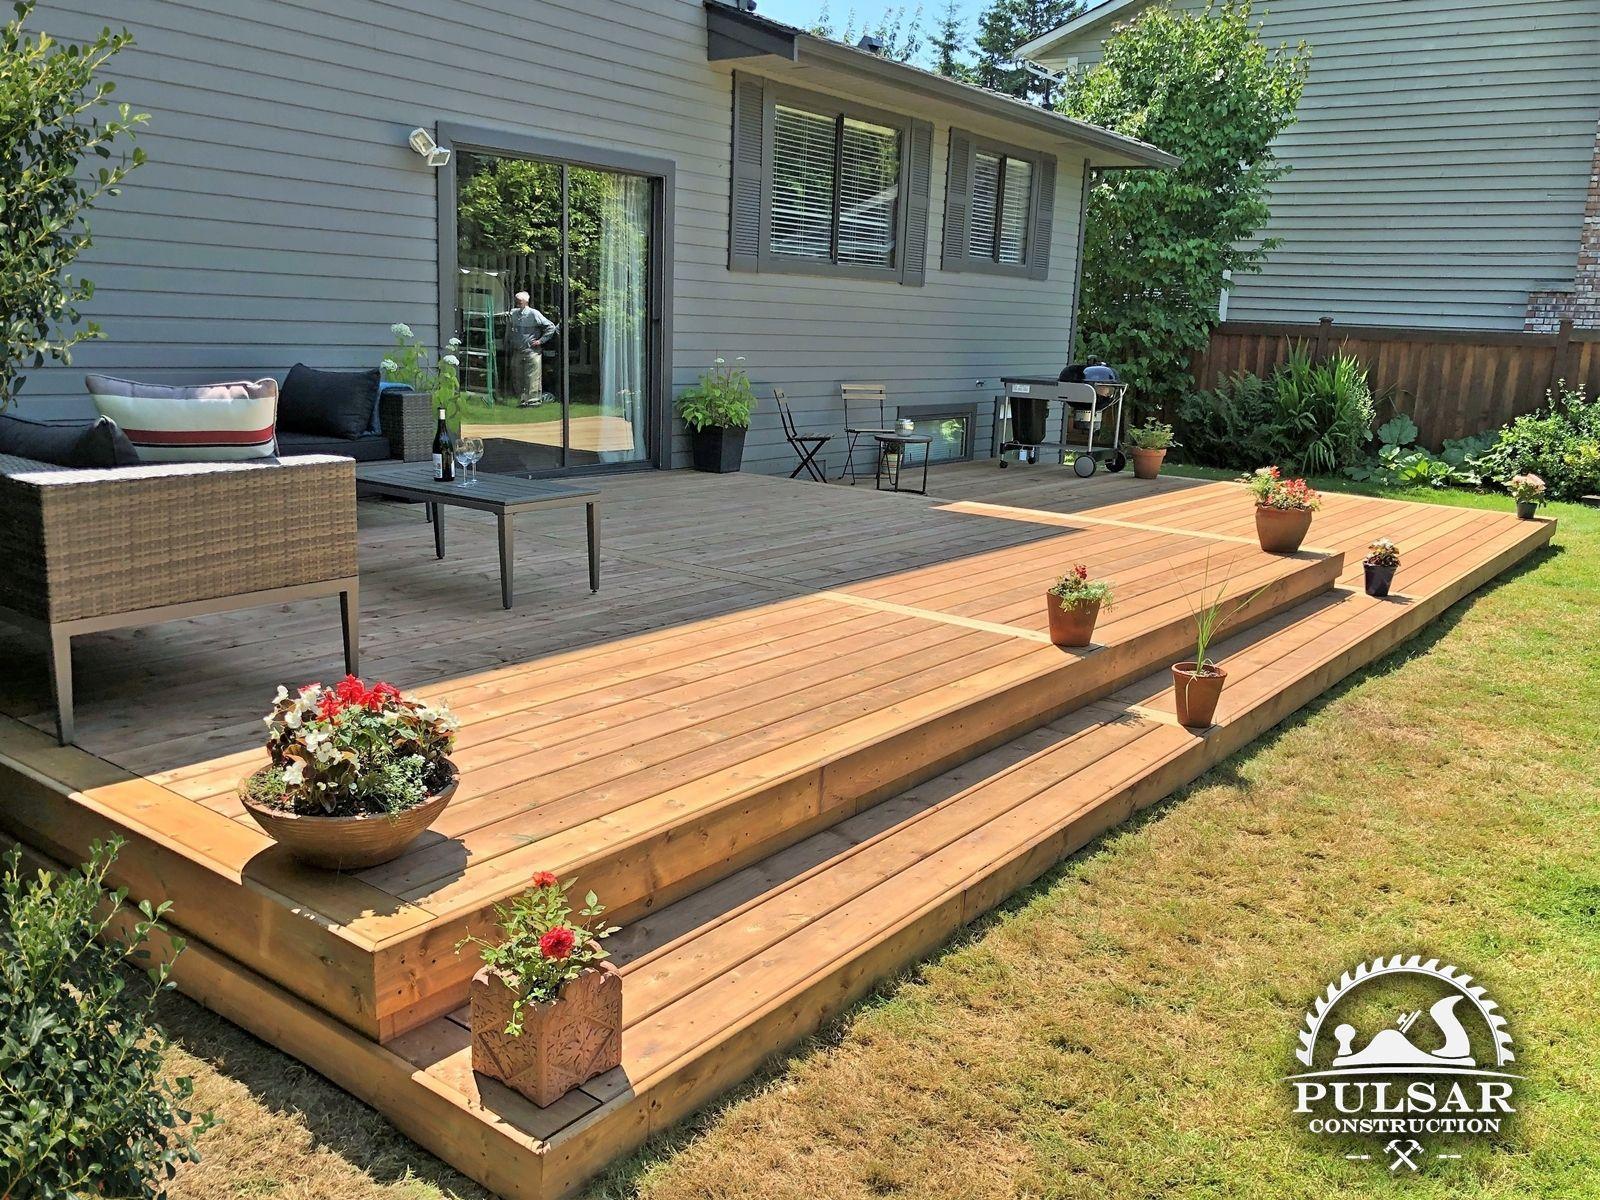 Split Level Patio Deck Backyard Small Backyard Decks Patio Deck Designs Split level house backyard ideas